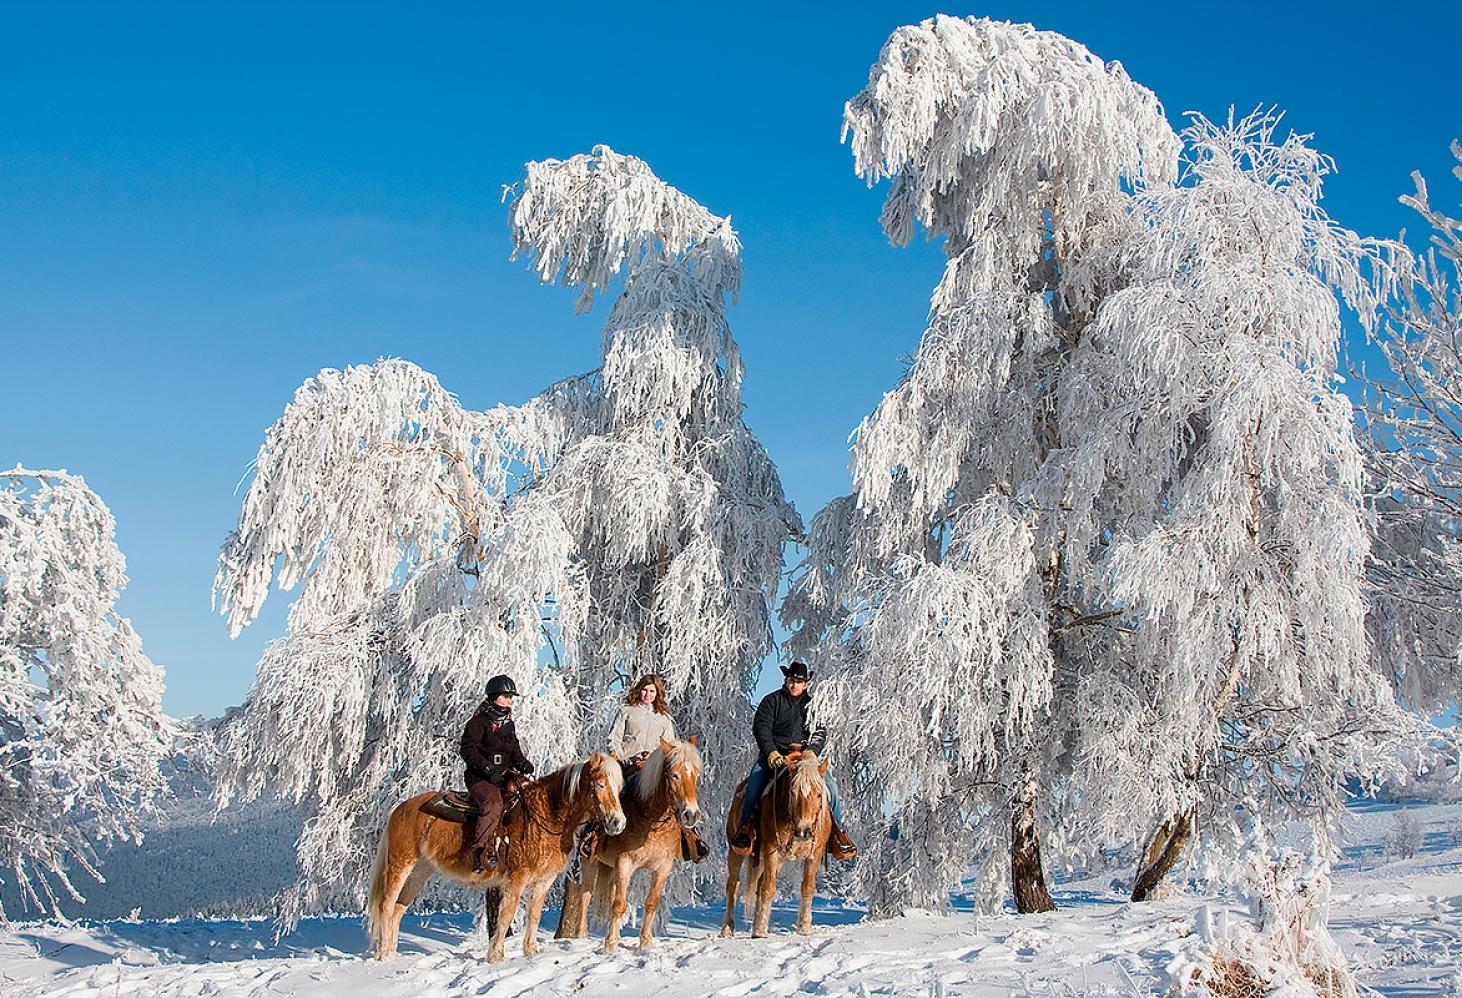 Долина Отцталь, Австрия